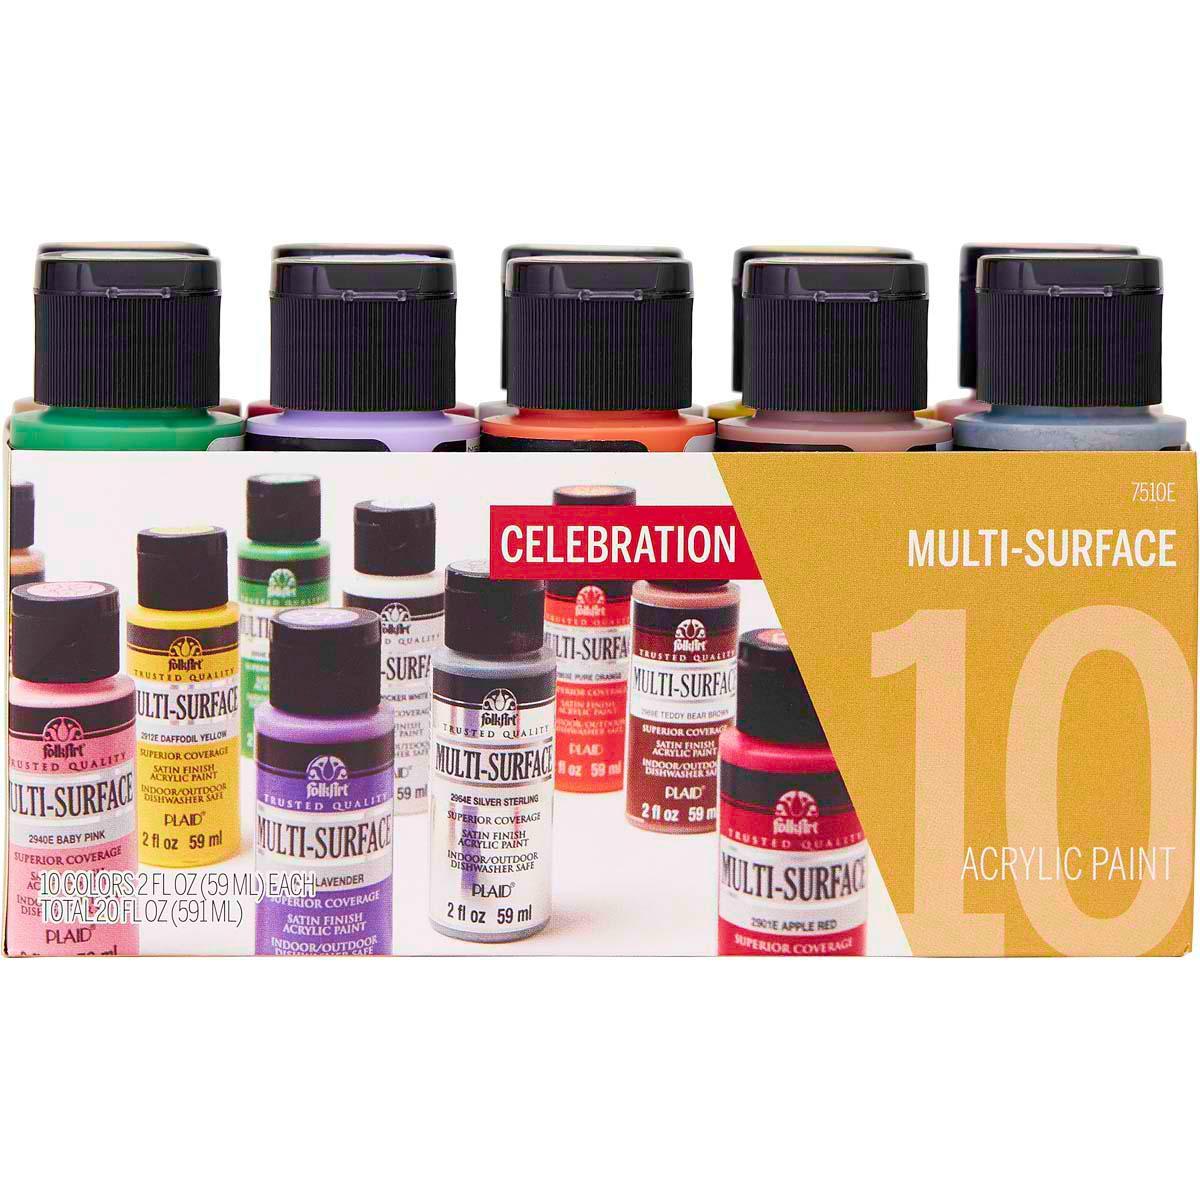 FolkArt ® Multi-Surface Satin Acrylic Paint 10 Color Set - Celebrations - 7510